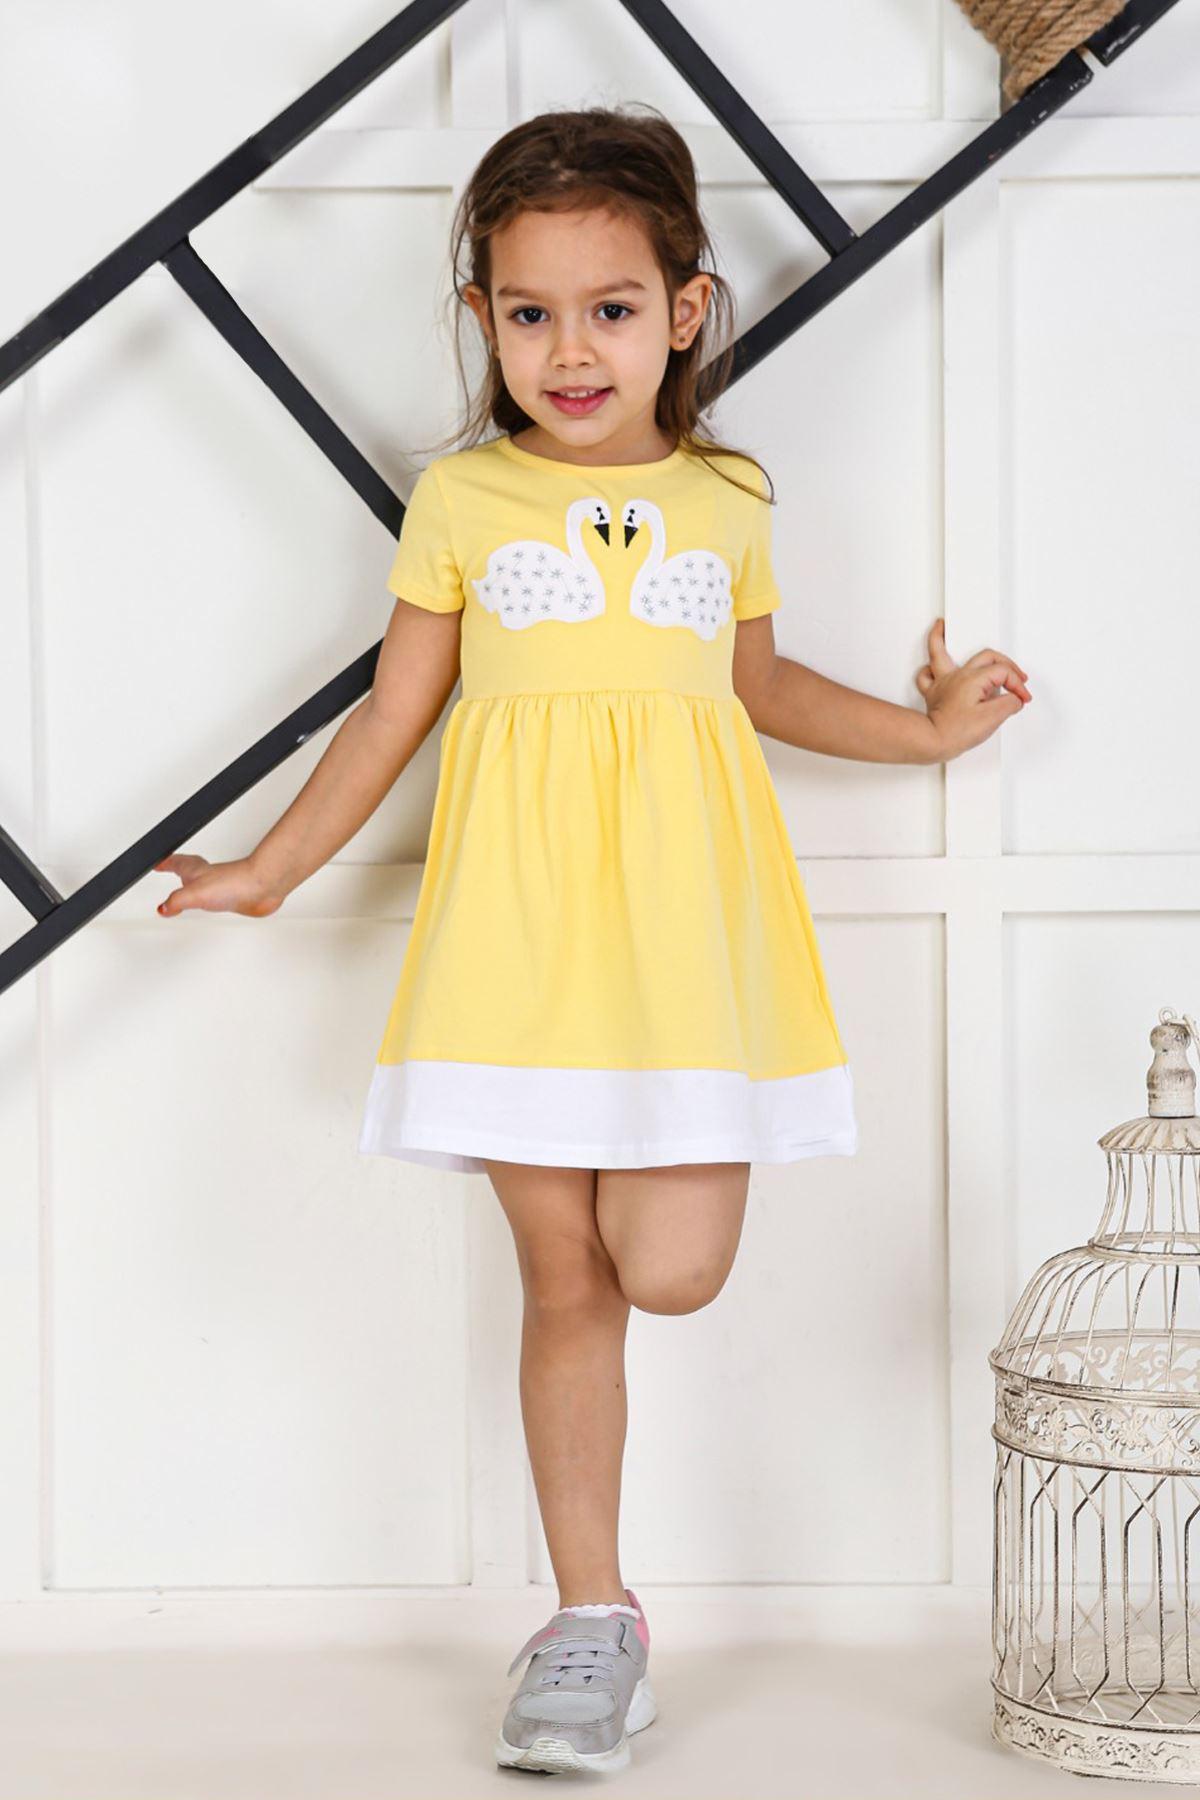 Yellow Kids 2021 Girls Girls' Skirt Dress Suits Cotton Casual Summer Children Clothing Girl Dress Cute Holiday Outfits Sport Mode